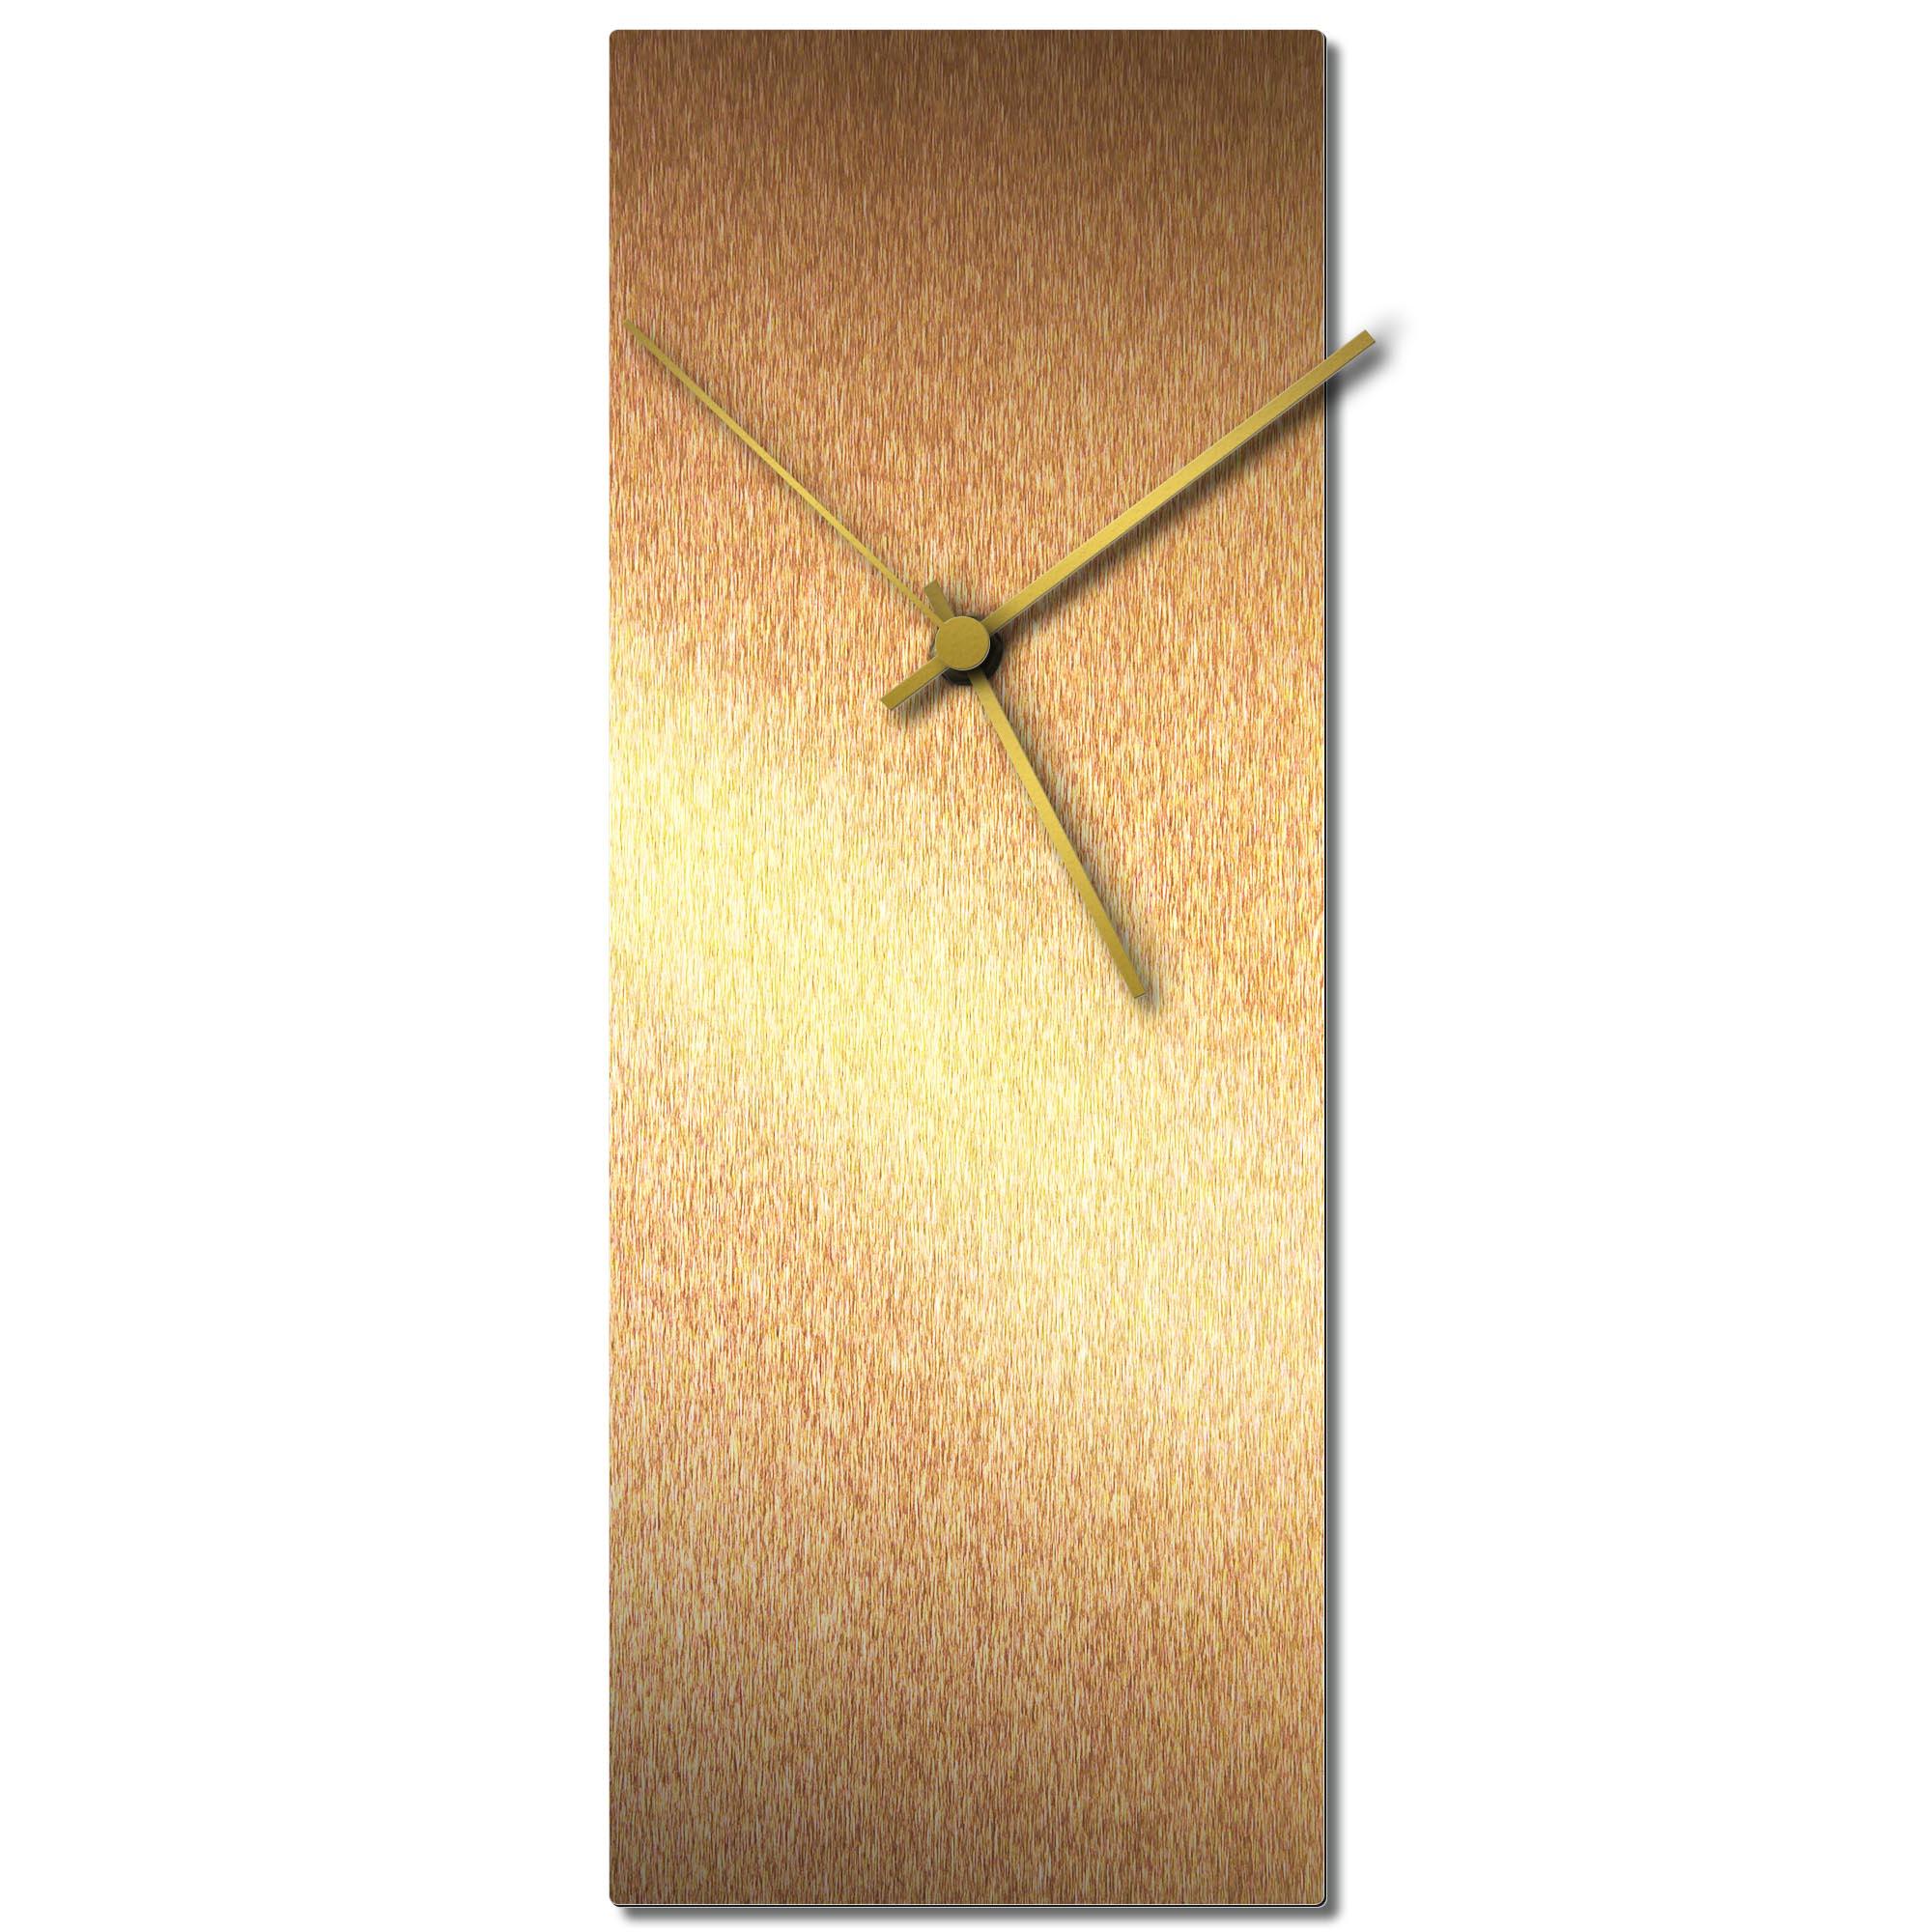 Adam Schwoeppe 'Bronzesmith Clock Gold' Midcentury Modern Style Wall Clock